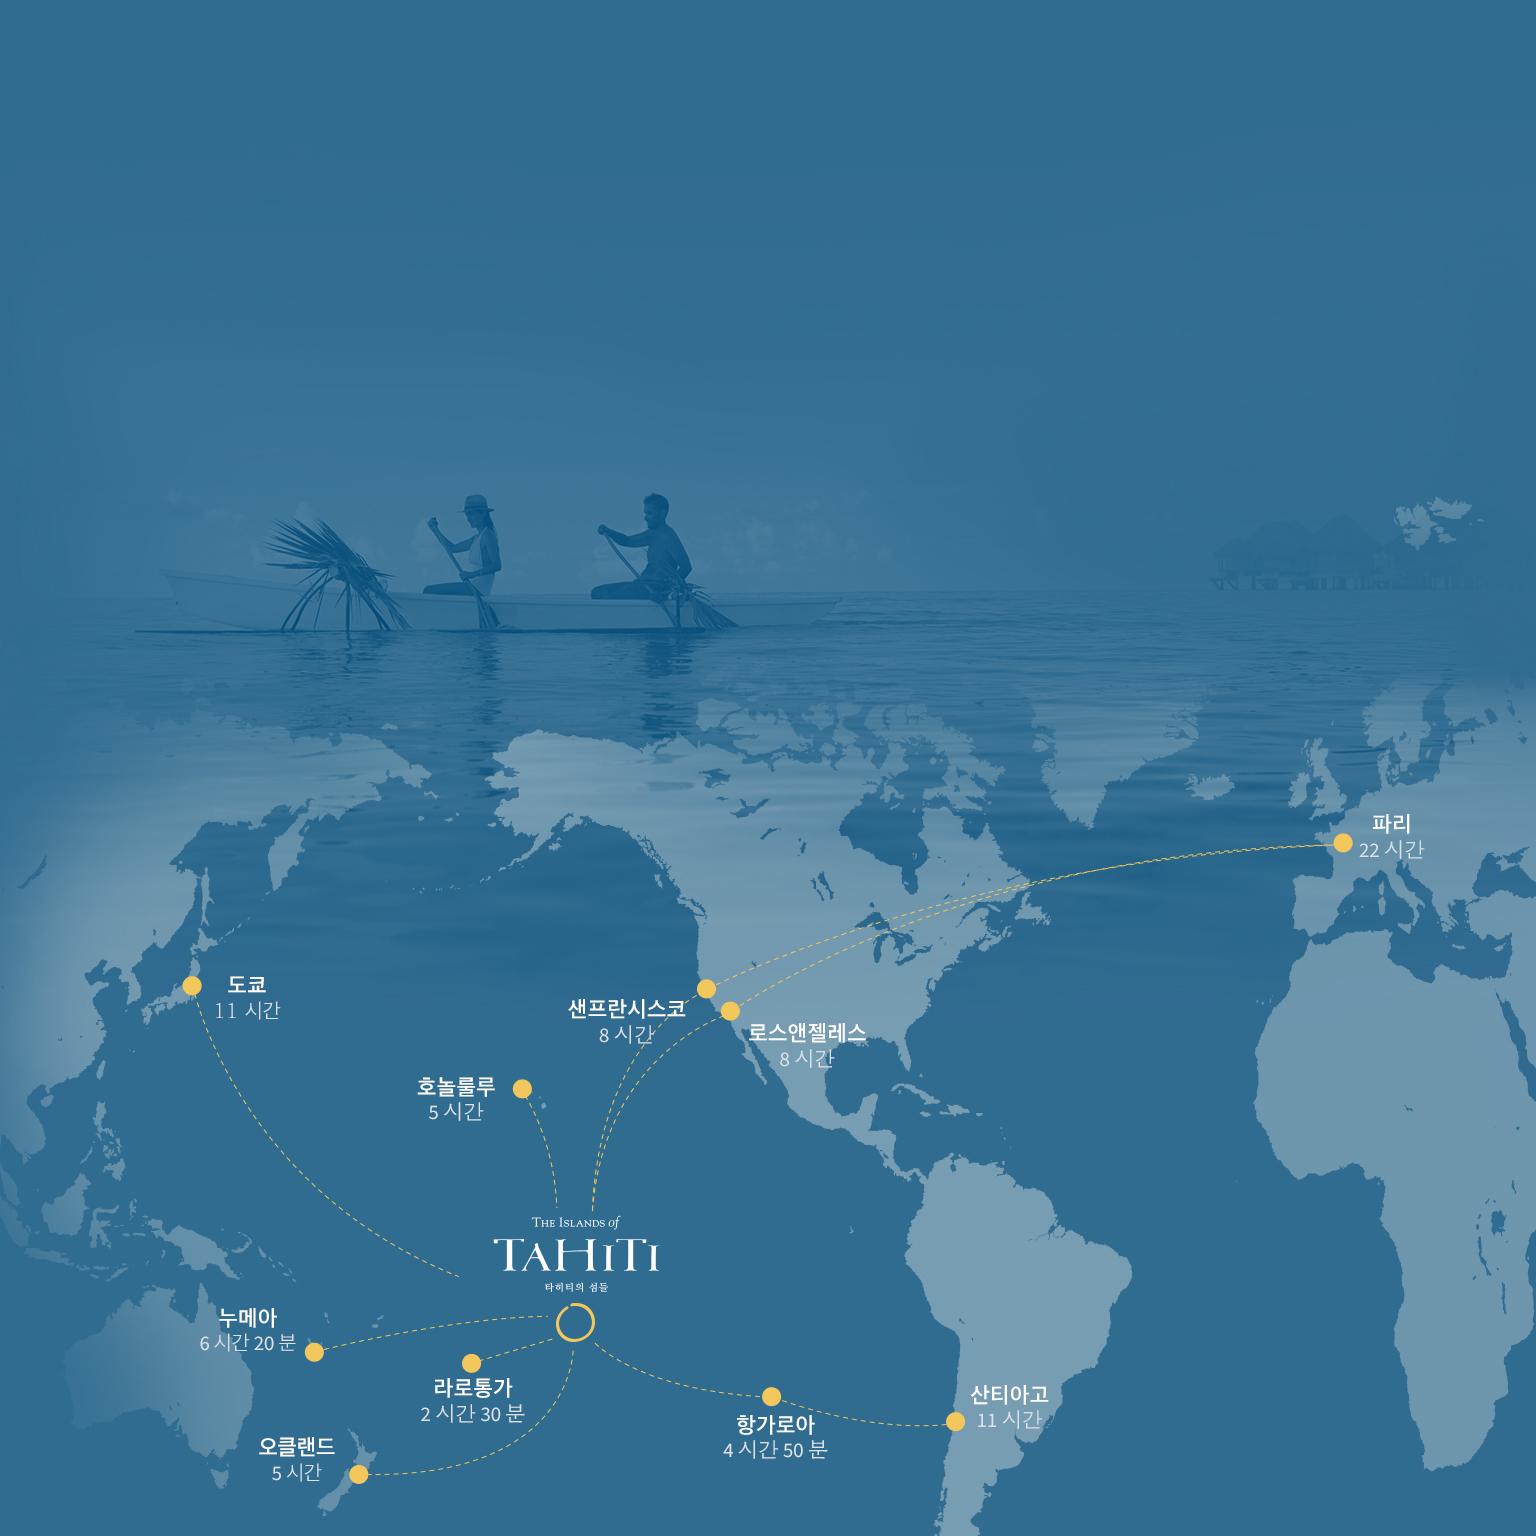 tahiti-homepage-map-t_korean   Tahiti Tourisme